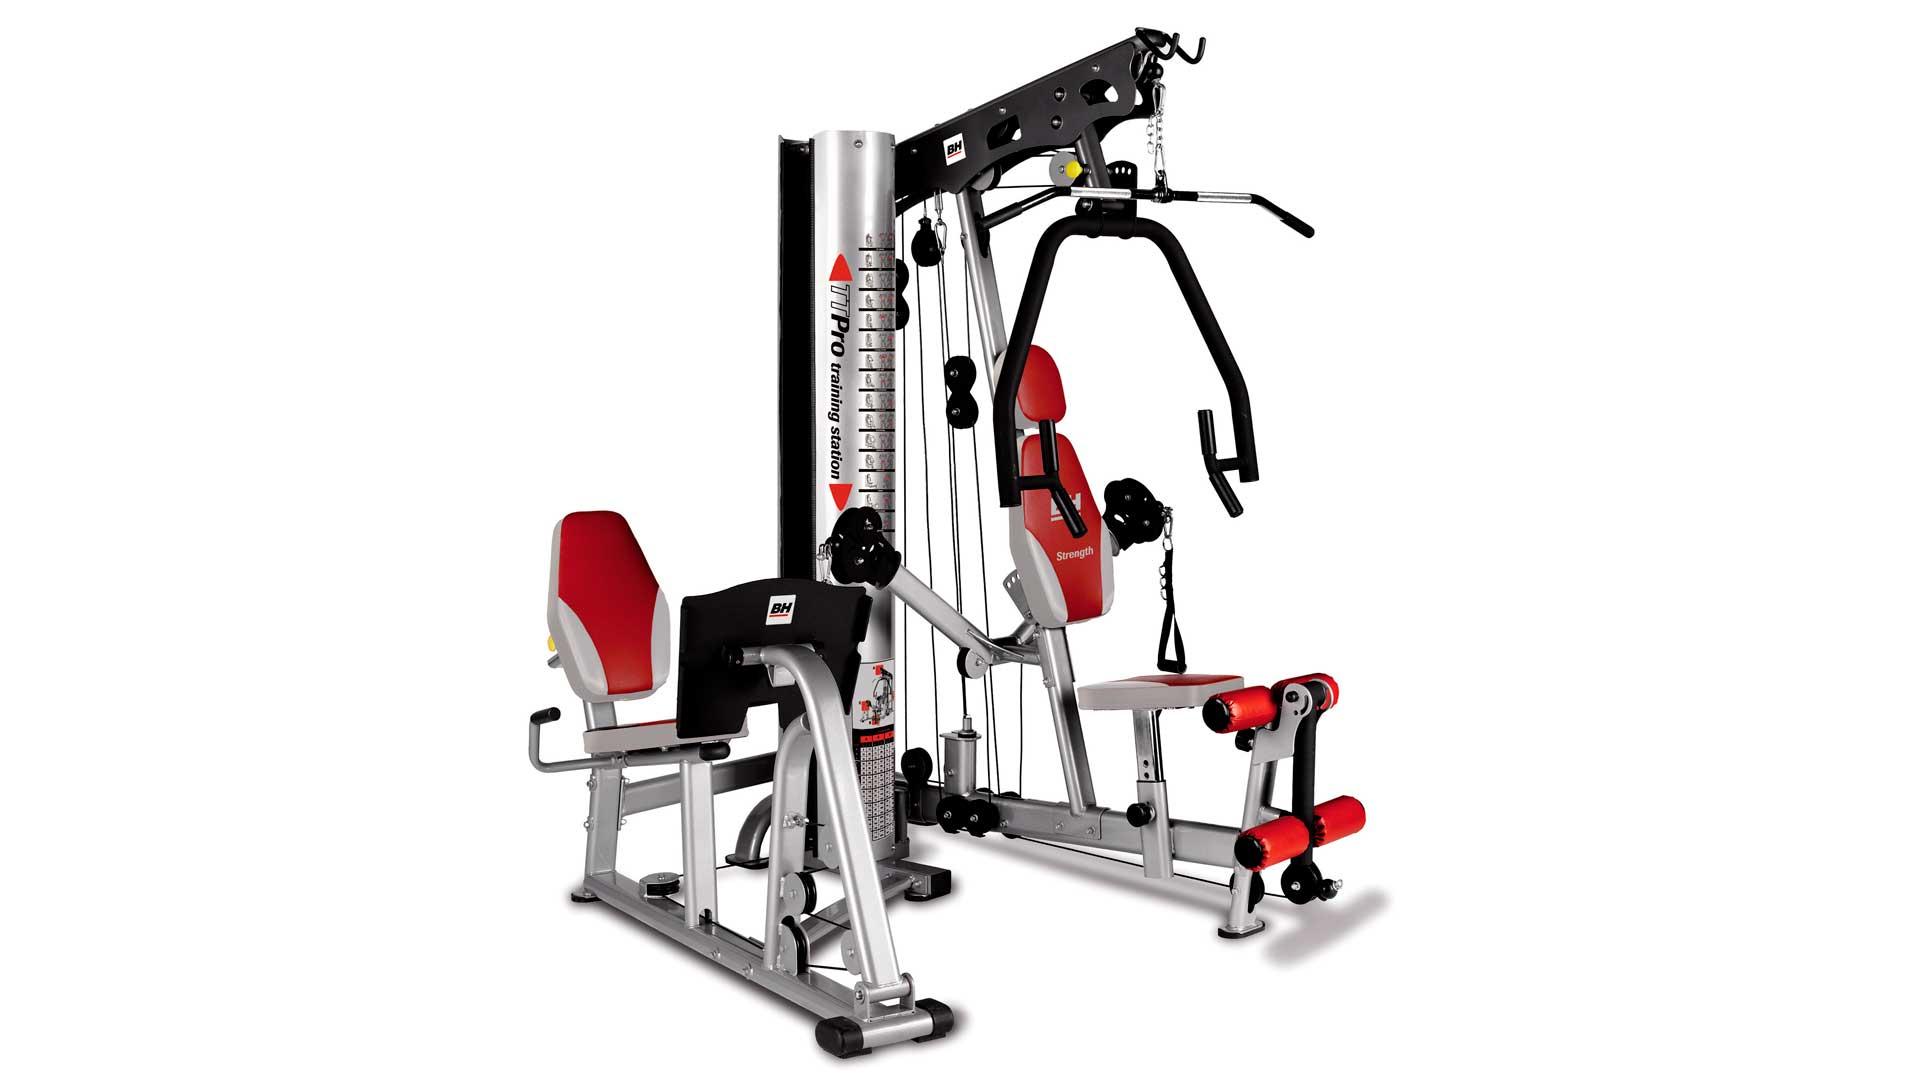 Multiestaci n tt pro i uso semi profesional i bh fitness for Aparatos de gym